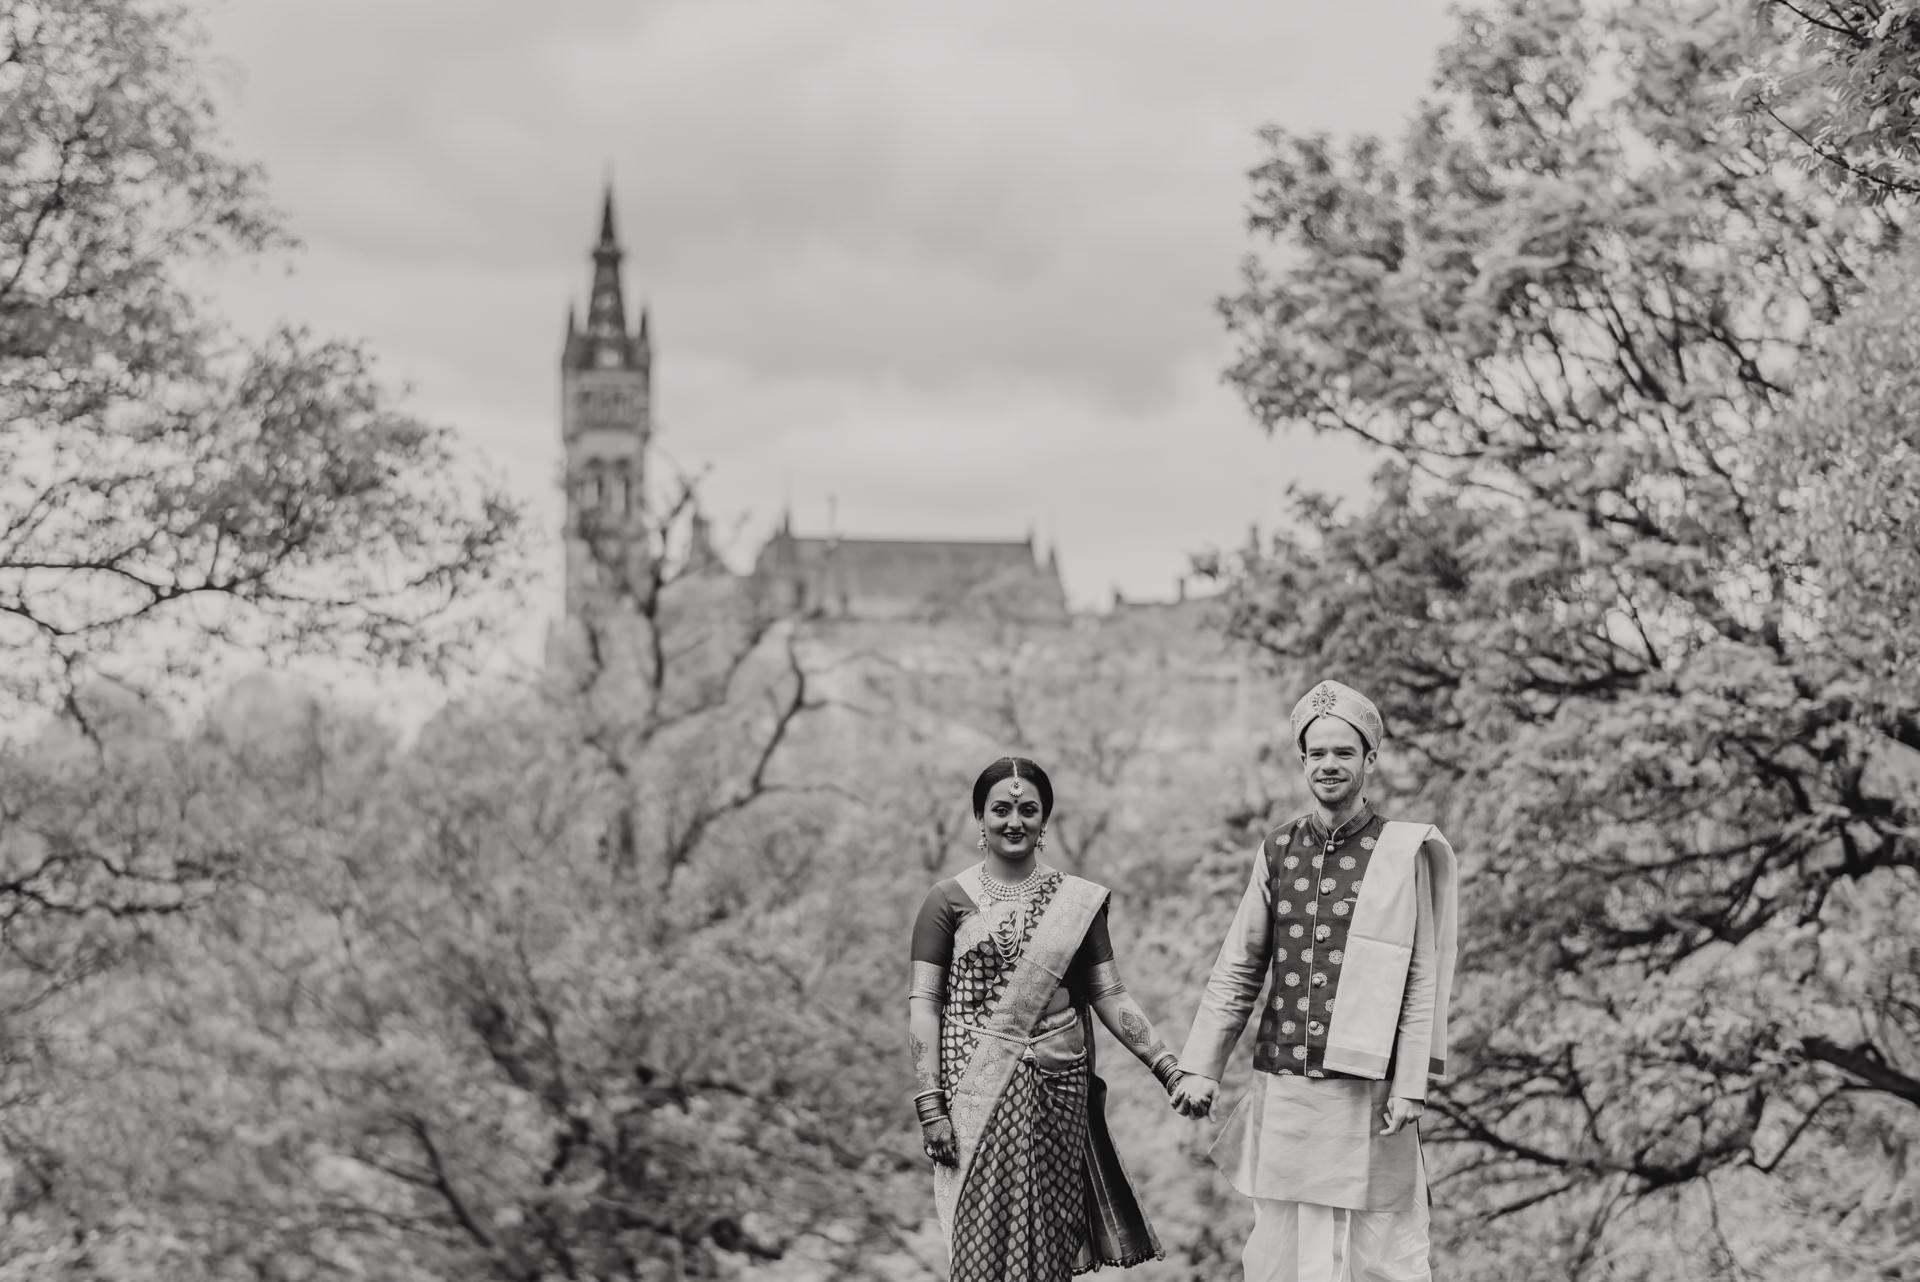 Marriott Glasgow wedding photos, wedding Marriott Glasgow, wedding photographer Edinburgh, wedding photographer Scotland, wedding photographer Glasgow, Karol Makula Photography, wedding photography Scotland, Scotland wedding photographer